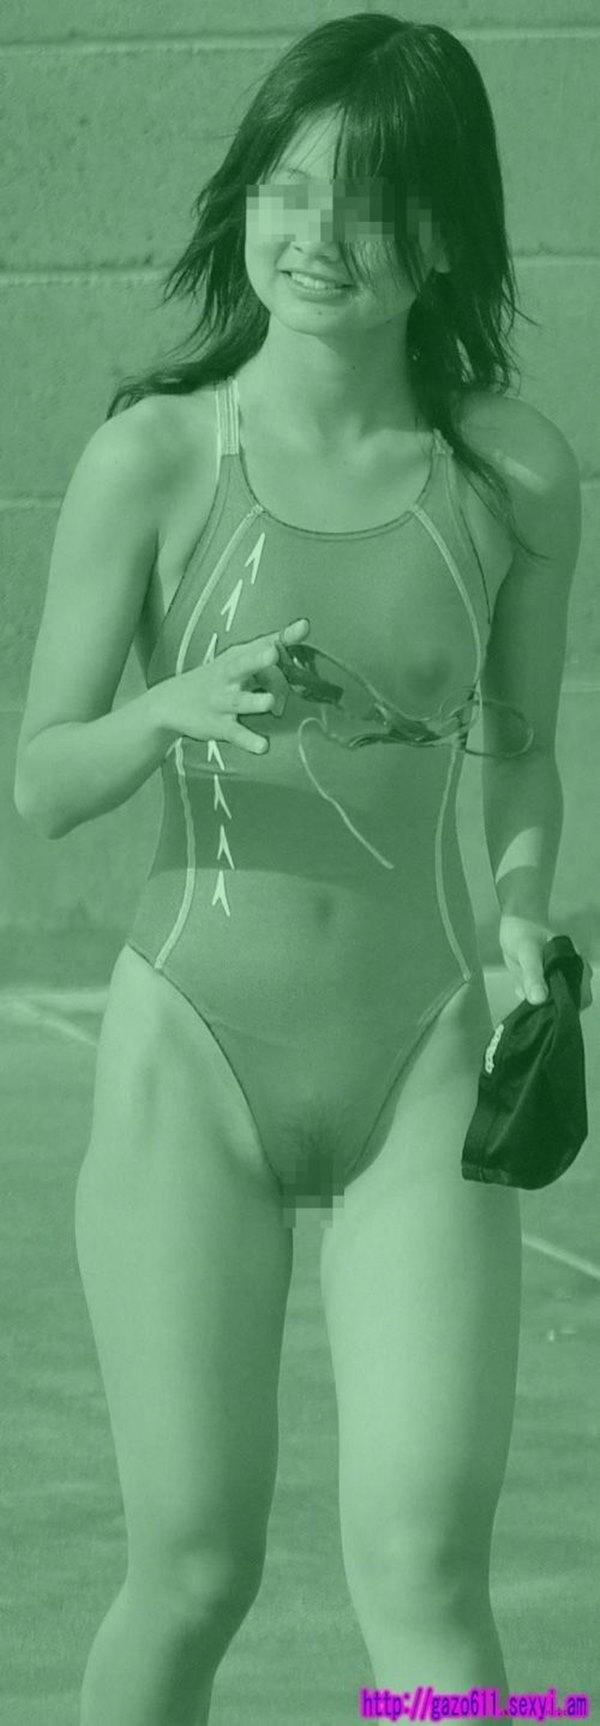 JK-high-school-girl-tits-Nipple-Manko-Pussy-Buttocks-Anal-Erotic-image15